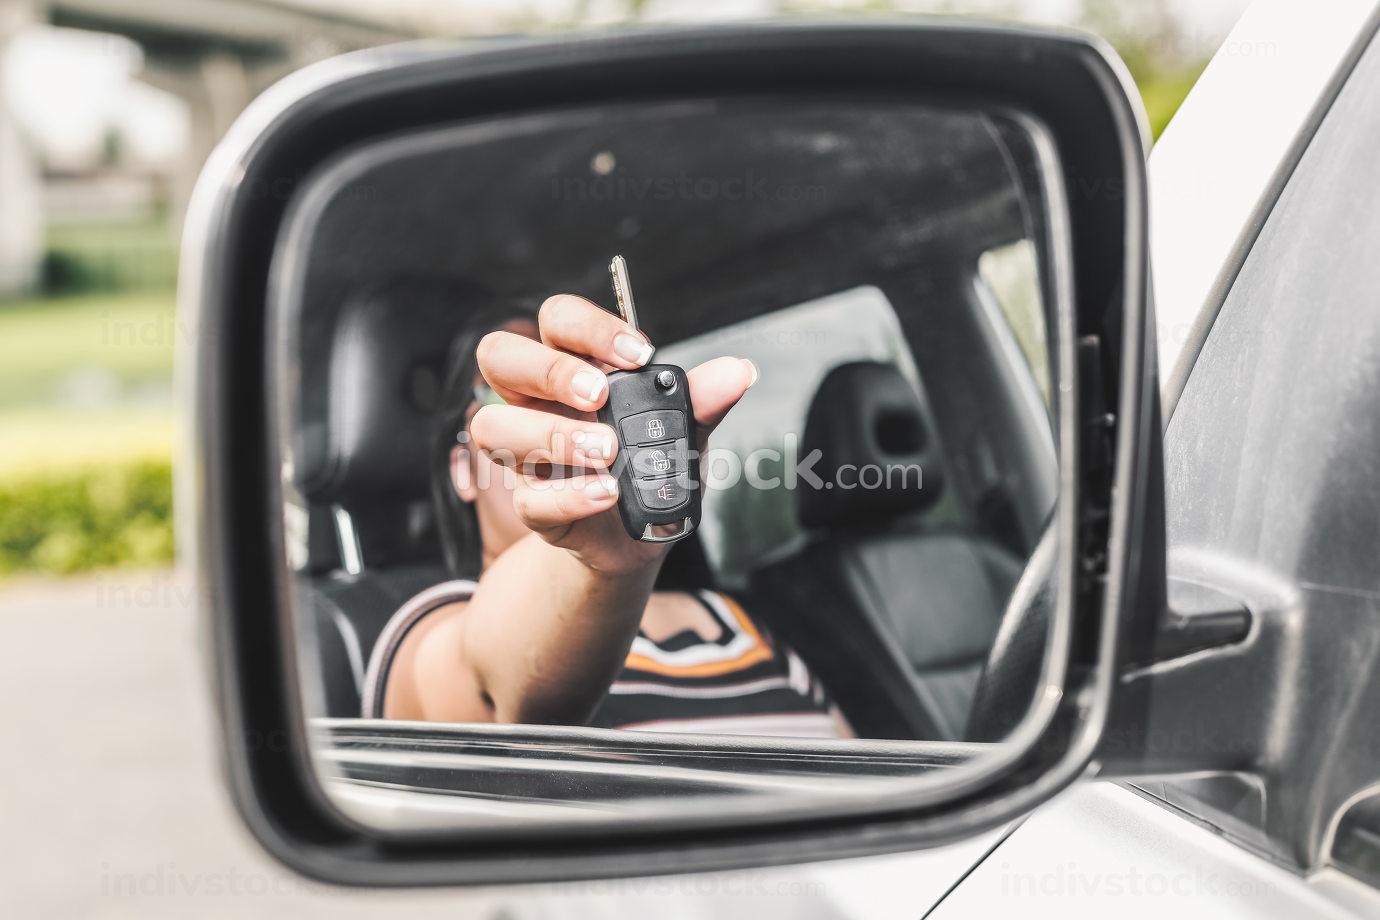 Car key in woman's hand nice shot